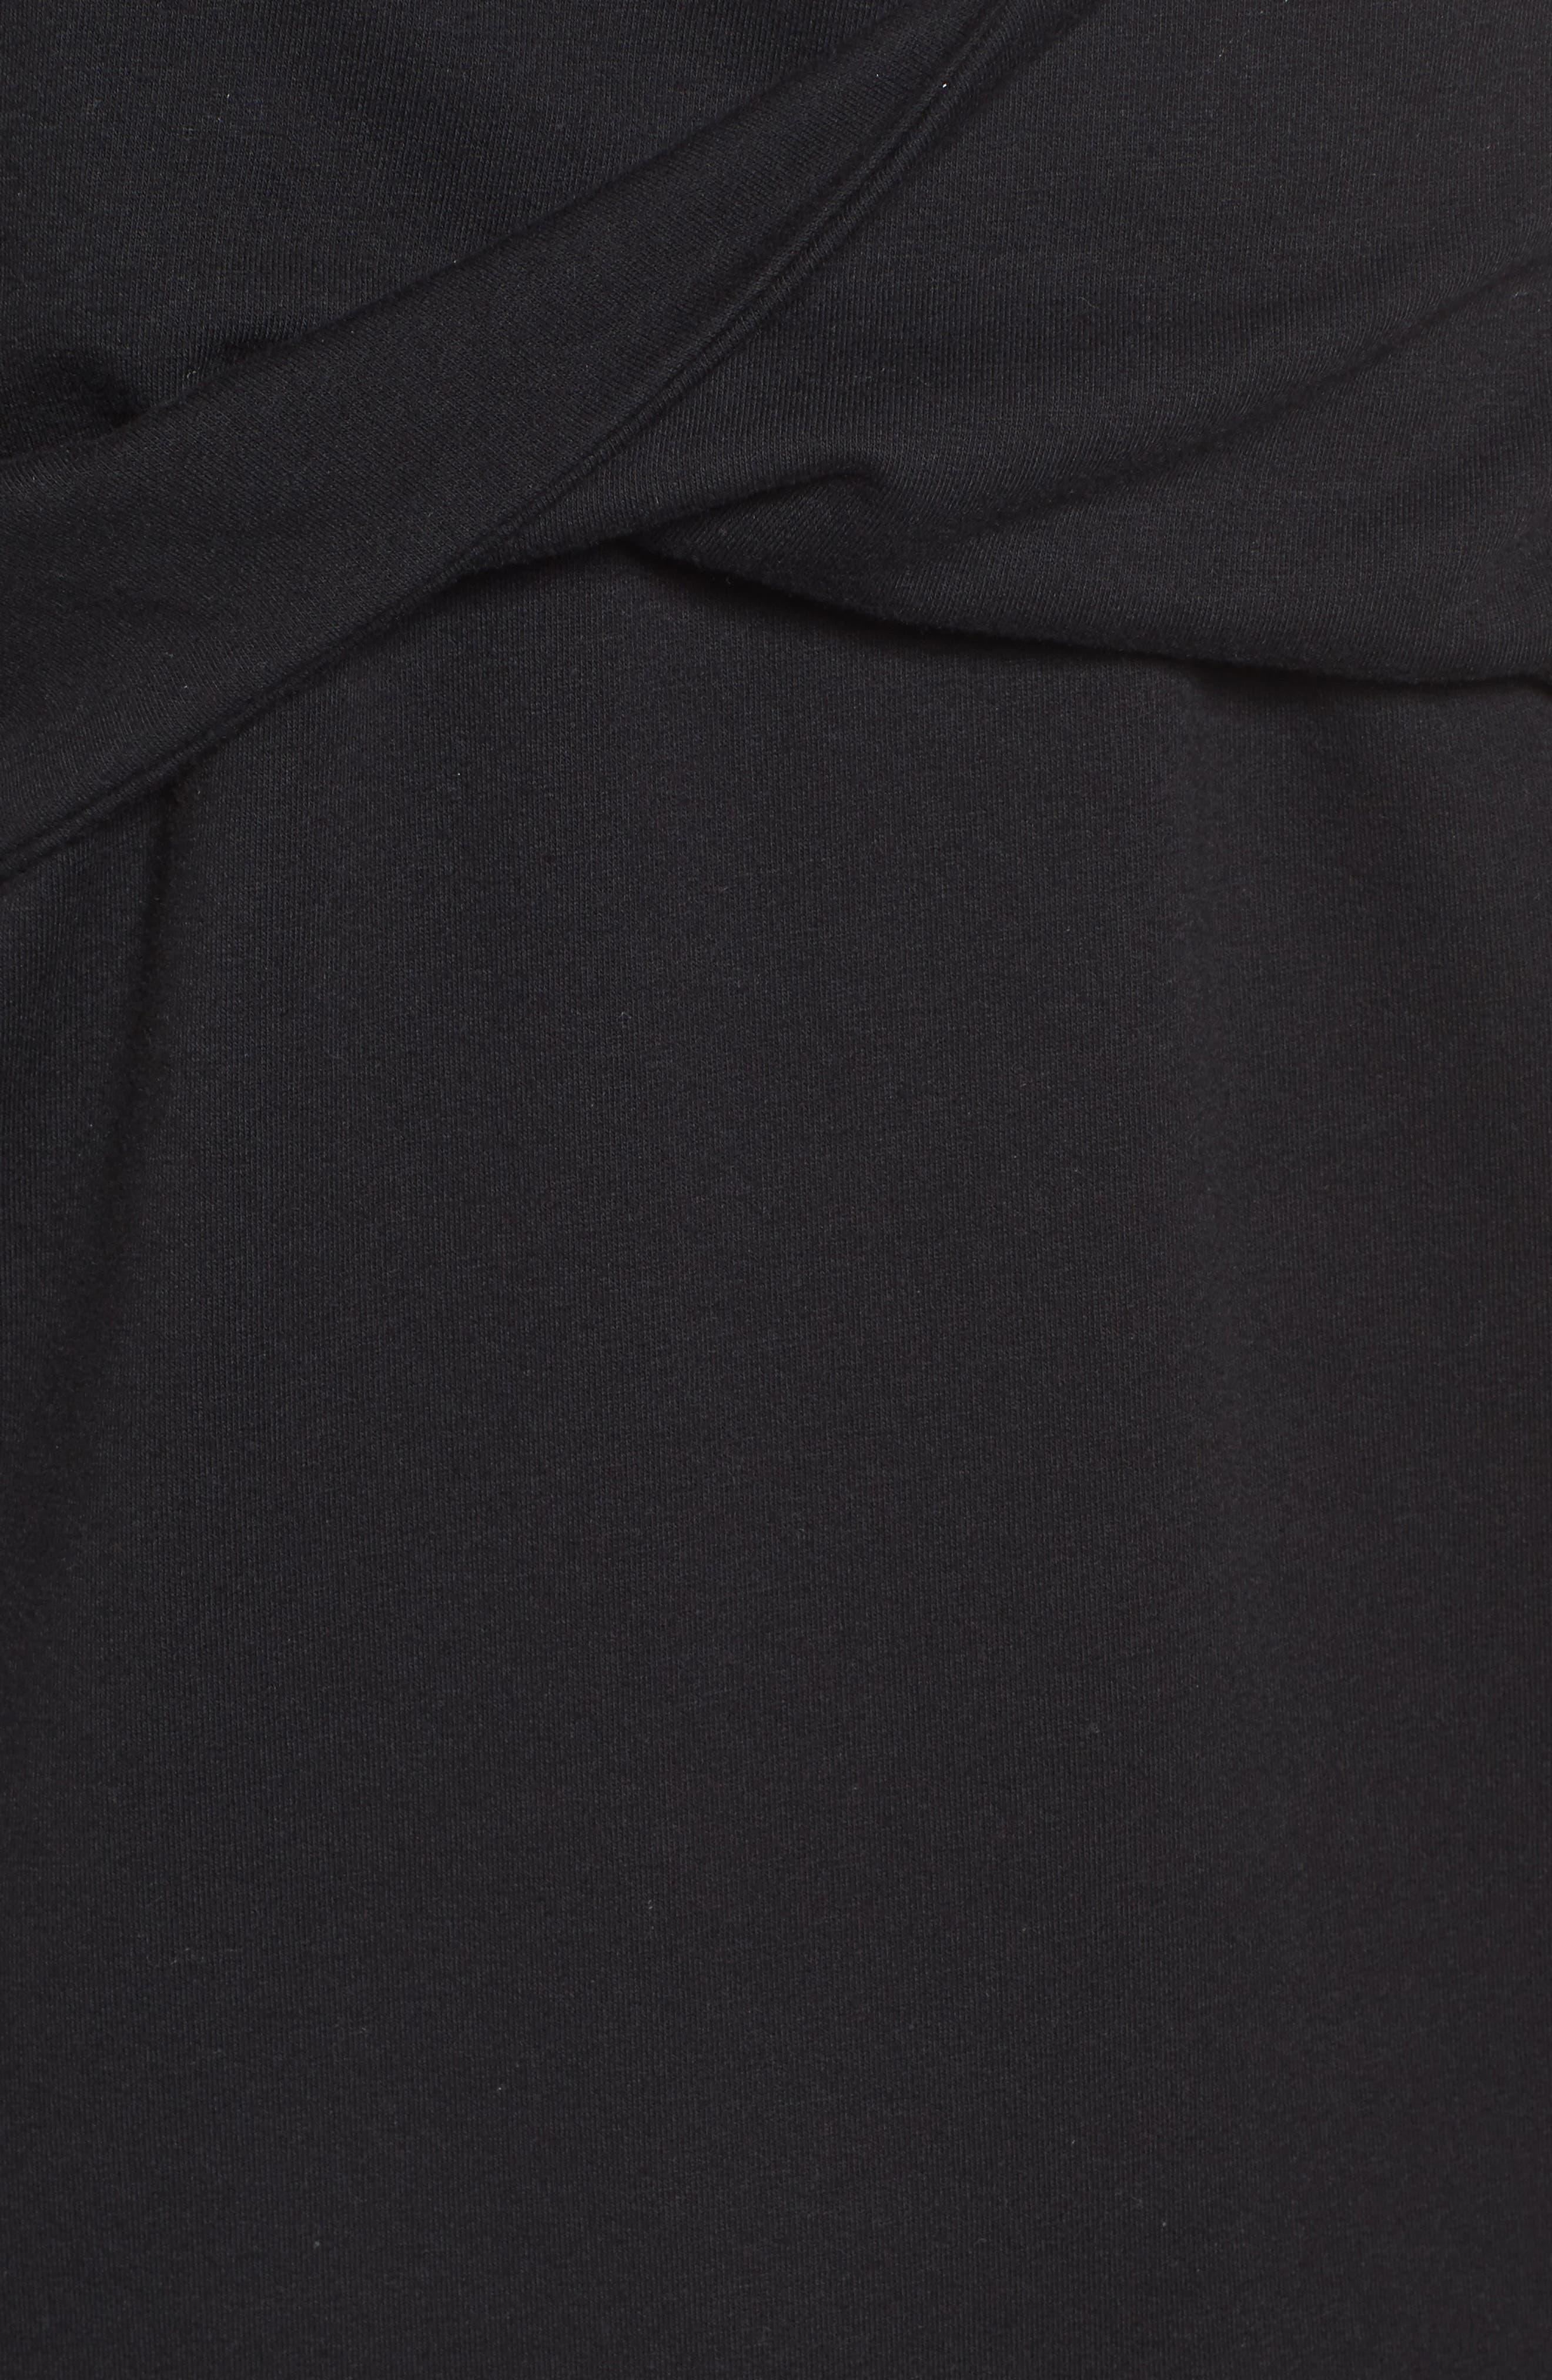 Twist Front Sweatshirt,                             Alternate thumbnail 5, color,                             001